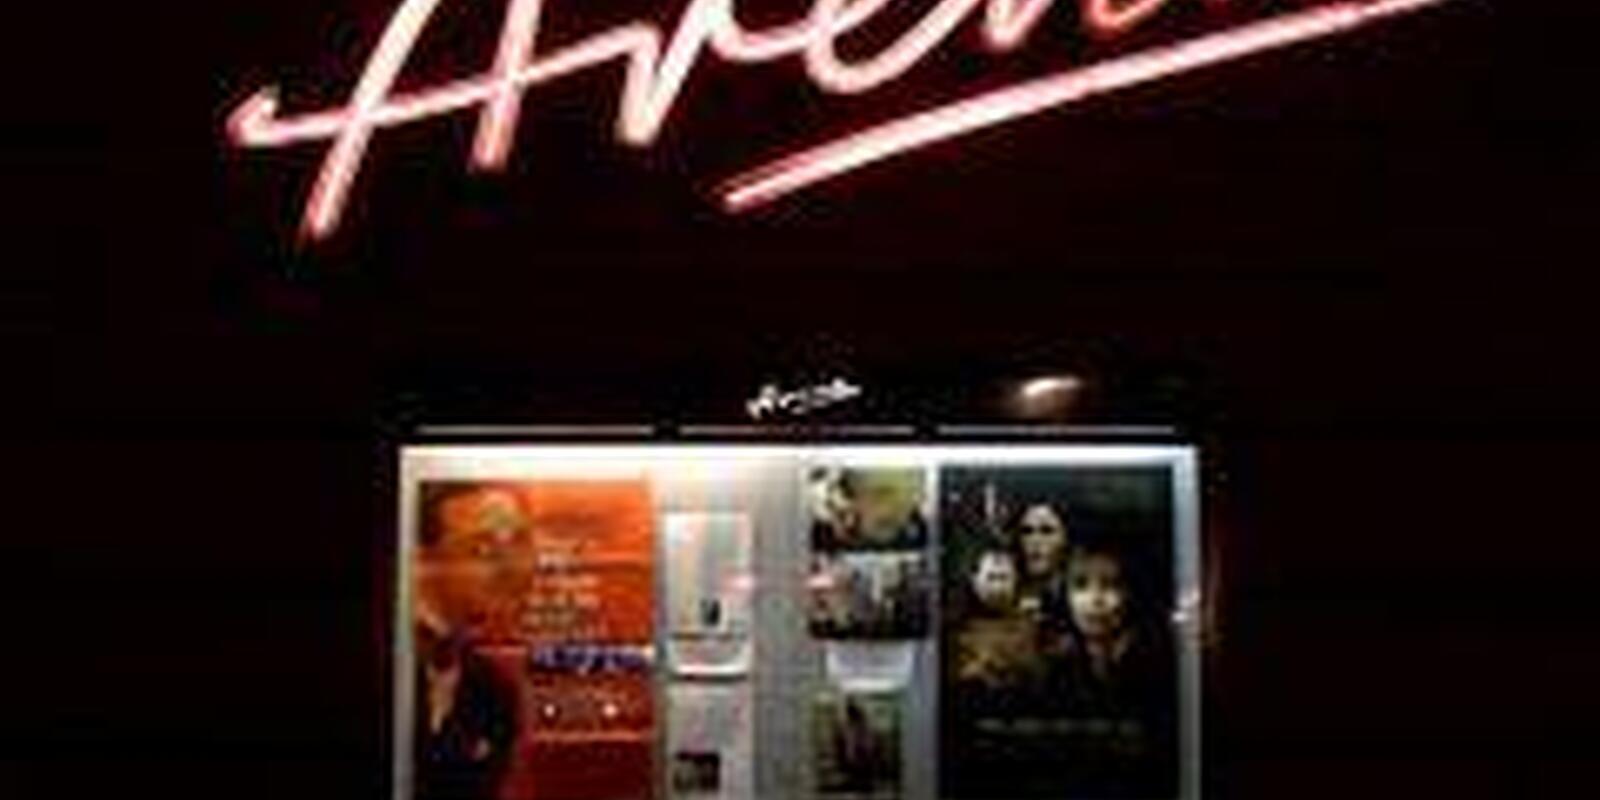 Kino Hans Sachs Straße